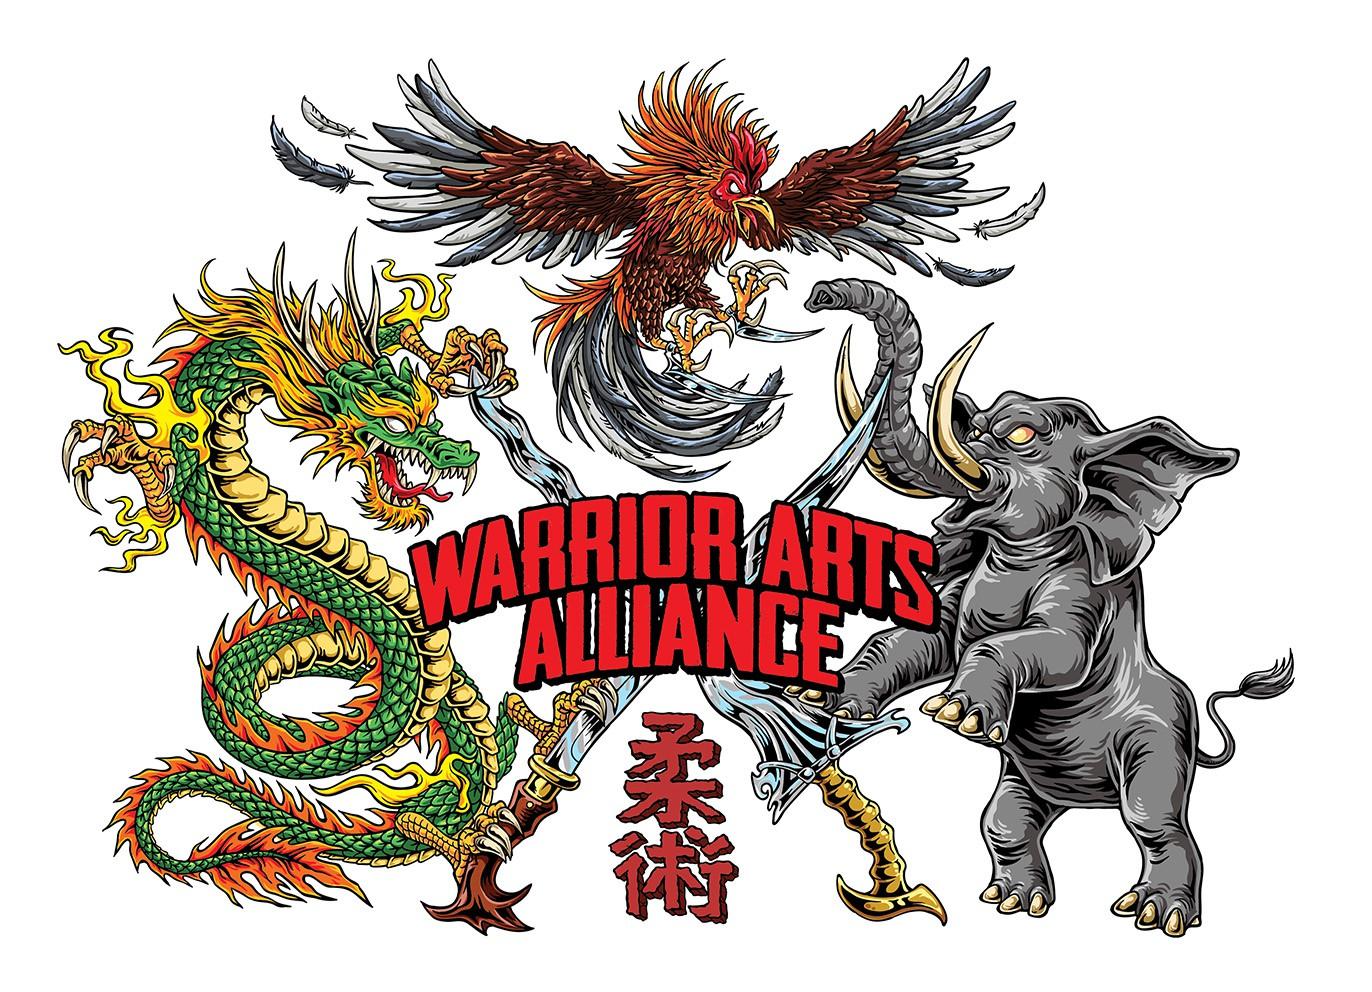 BATTLE READY! ... BAD ASS llustration for Warrior Arts Alliance